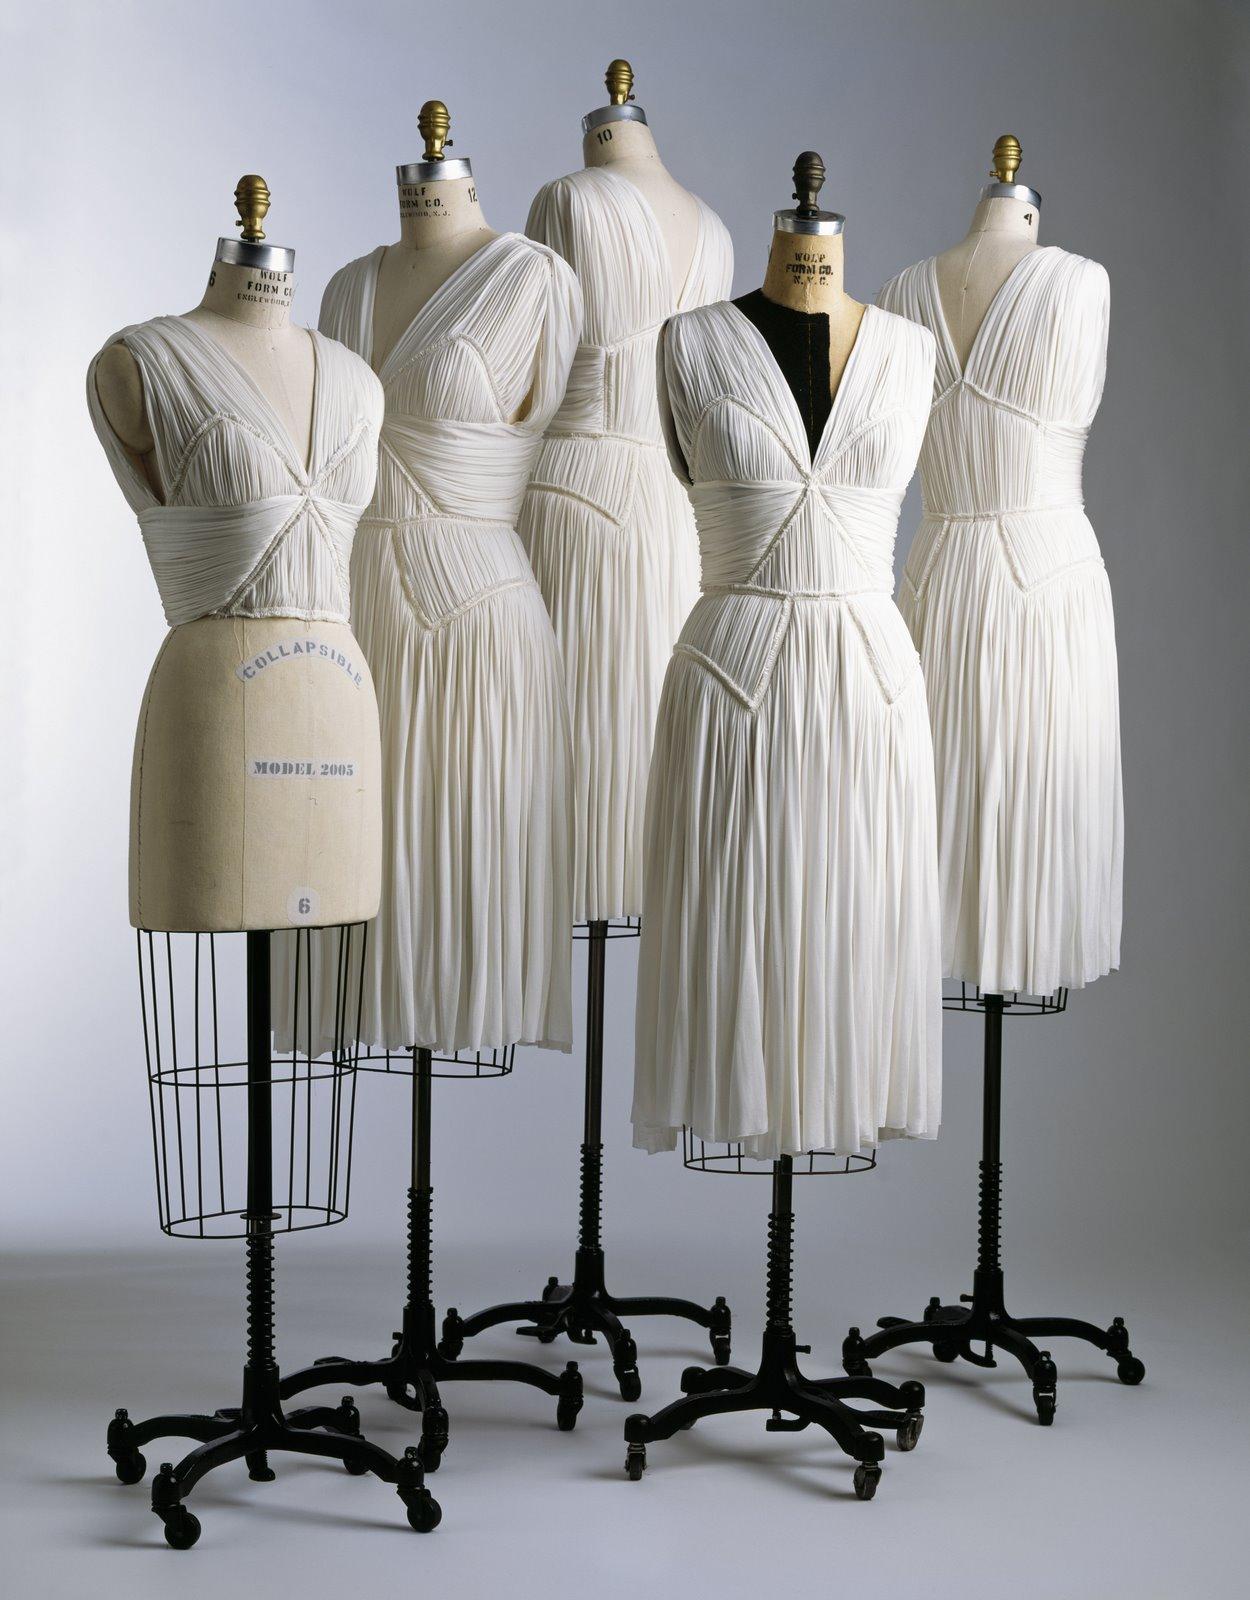 Diamond draped bodice dresses finished and unfinished fall 2005